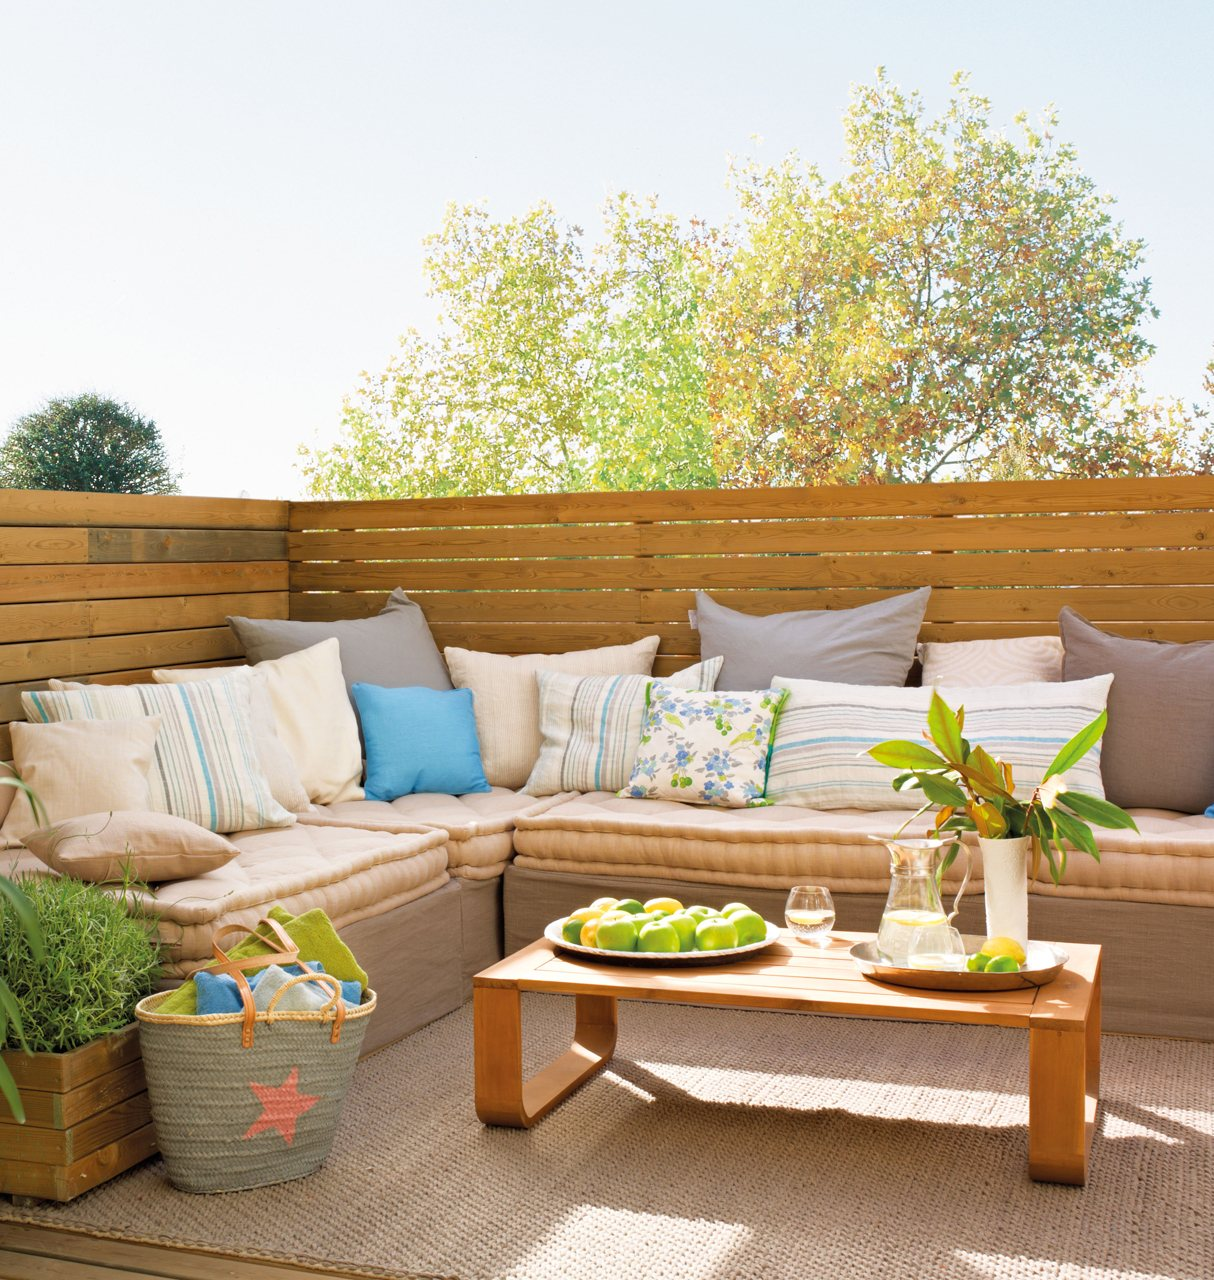 15 formas de aprovechar exteriores peque os for Sofa terraza madera